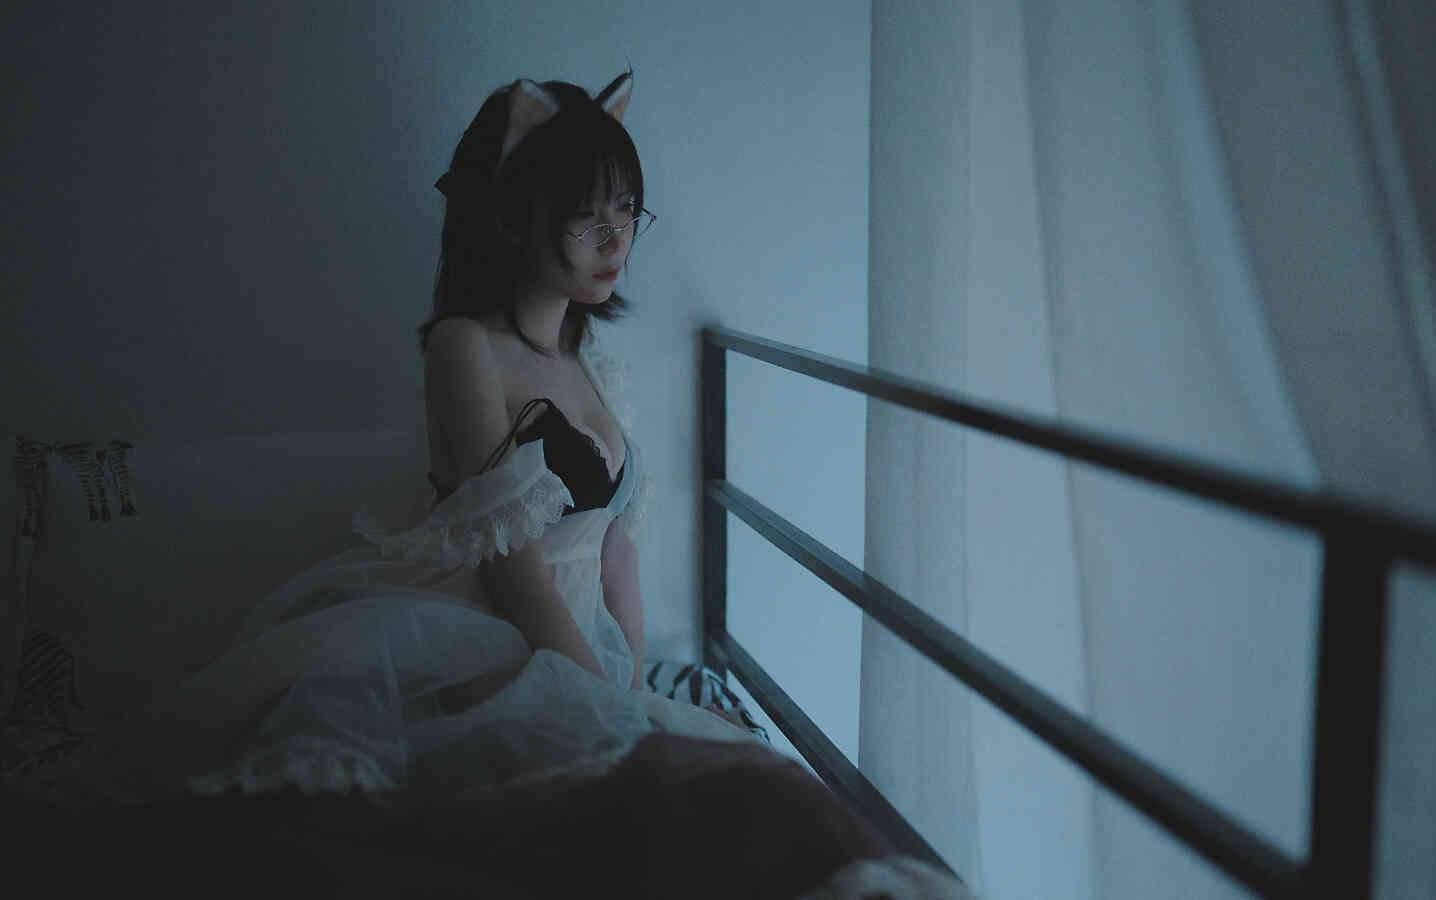 【Cosplay】逐月SU - 透明女仆未预售版 [46P/2.8G] COS-第3张